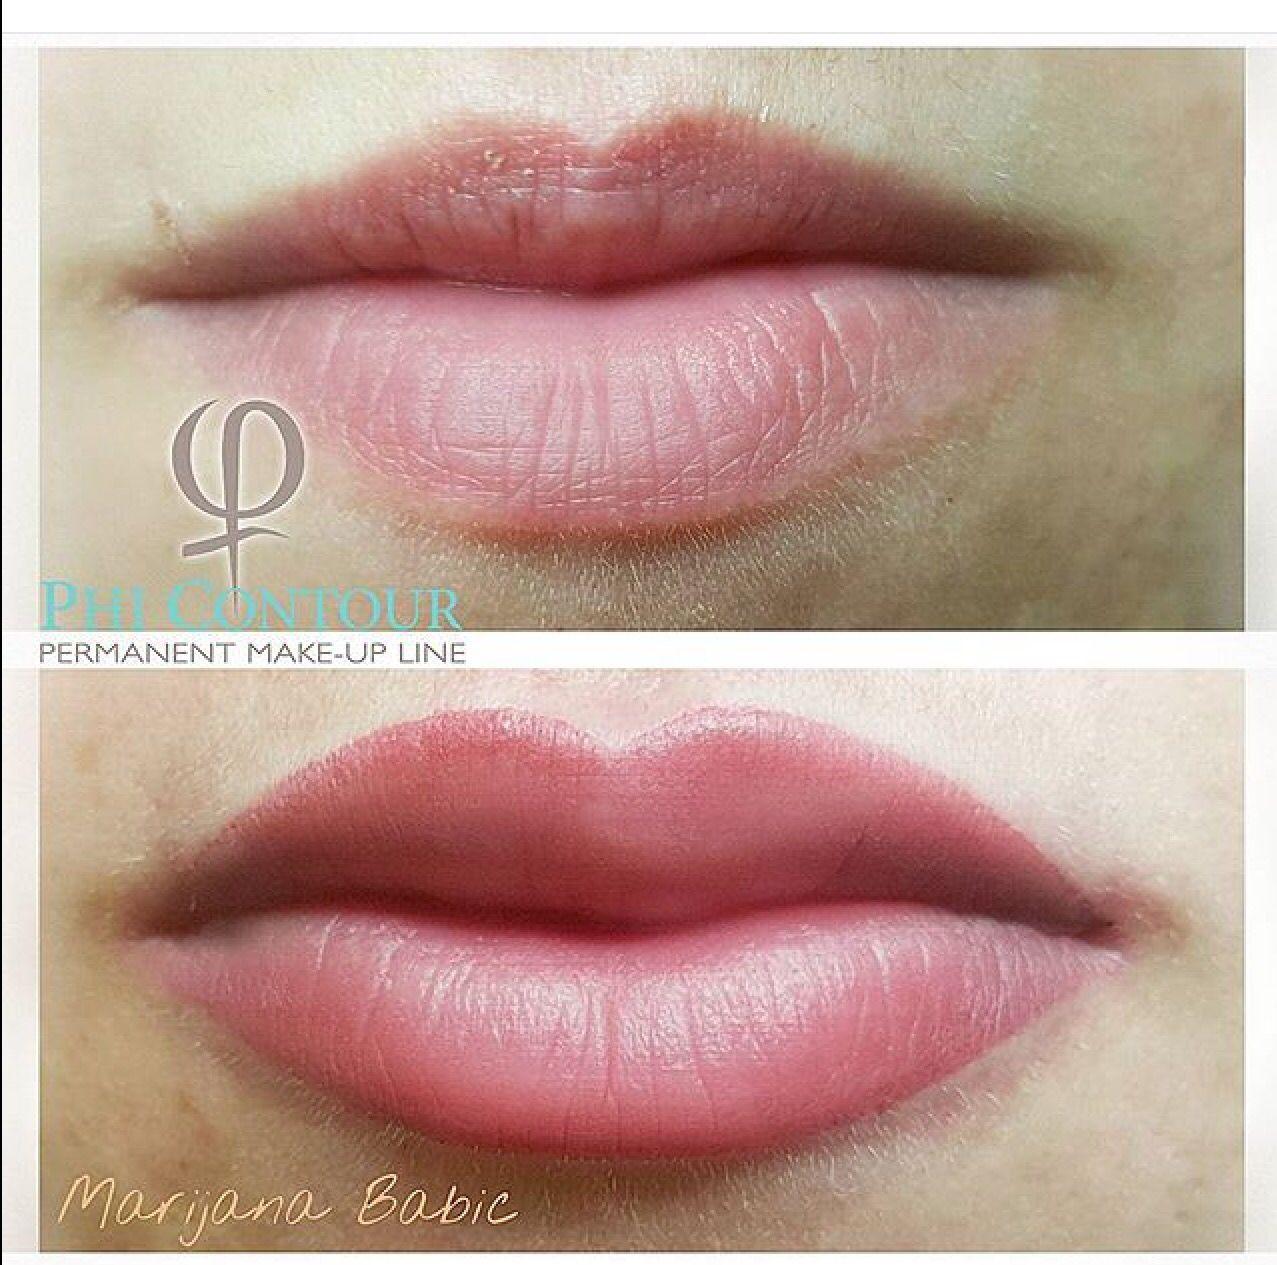 Pin By Christina Ege On Kalici Makyaj Lip Permanent Makeup Lip Color Makeup Permanent Lipstick